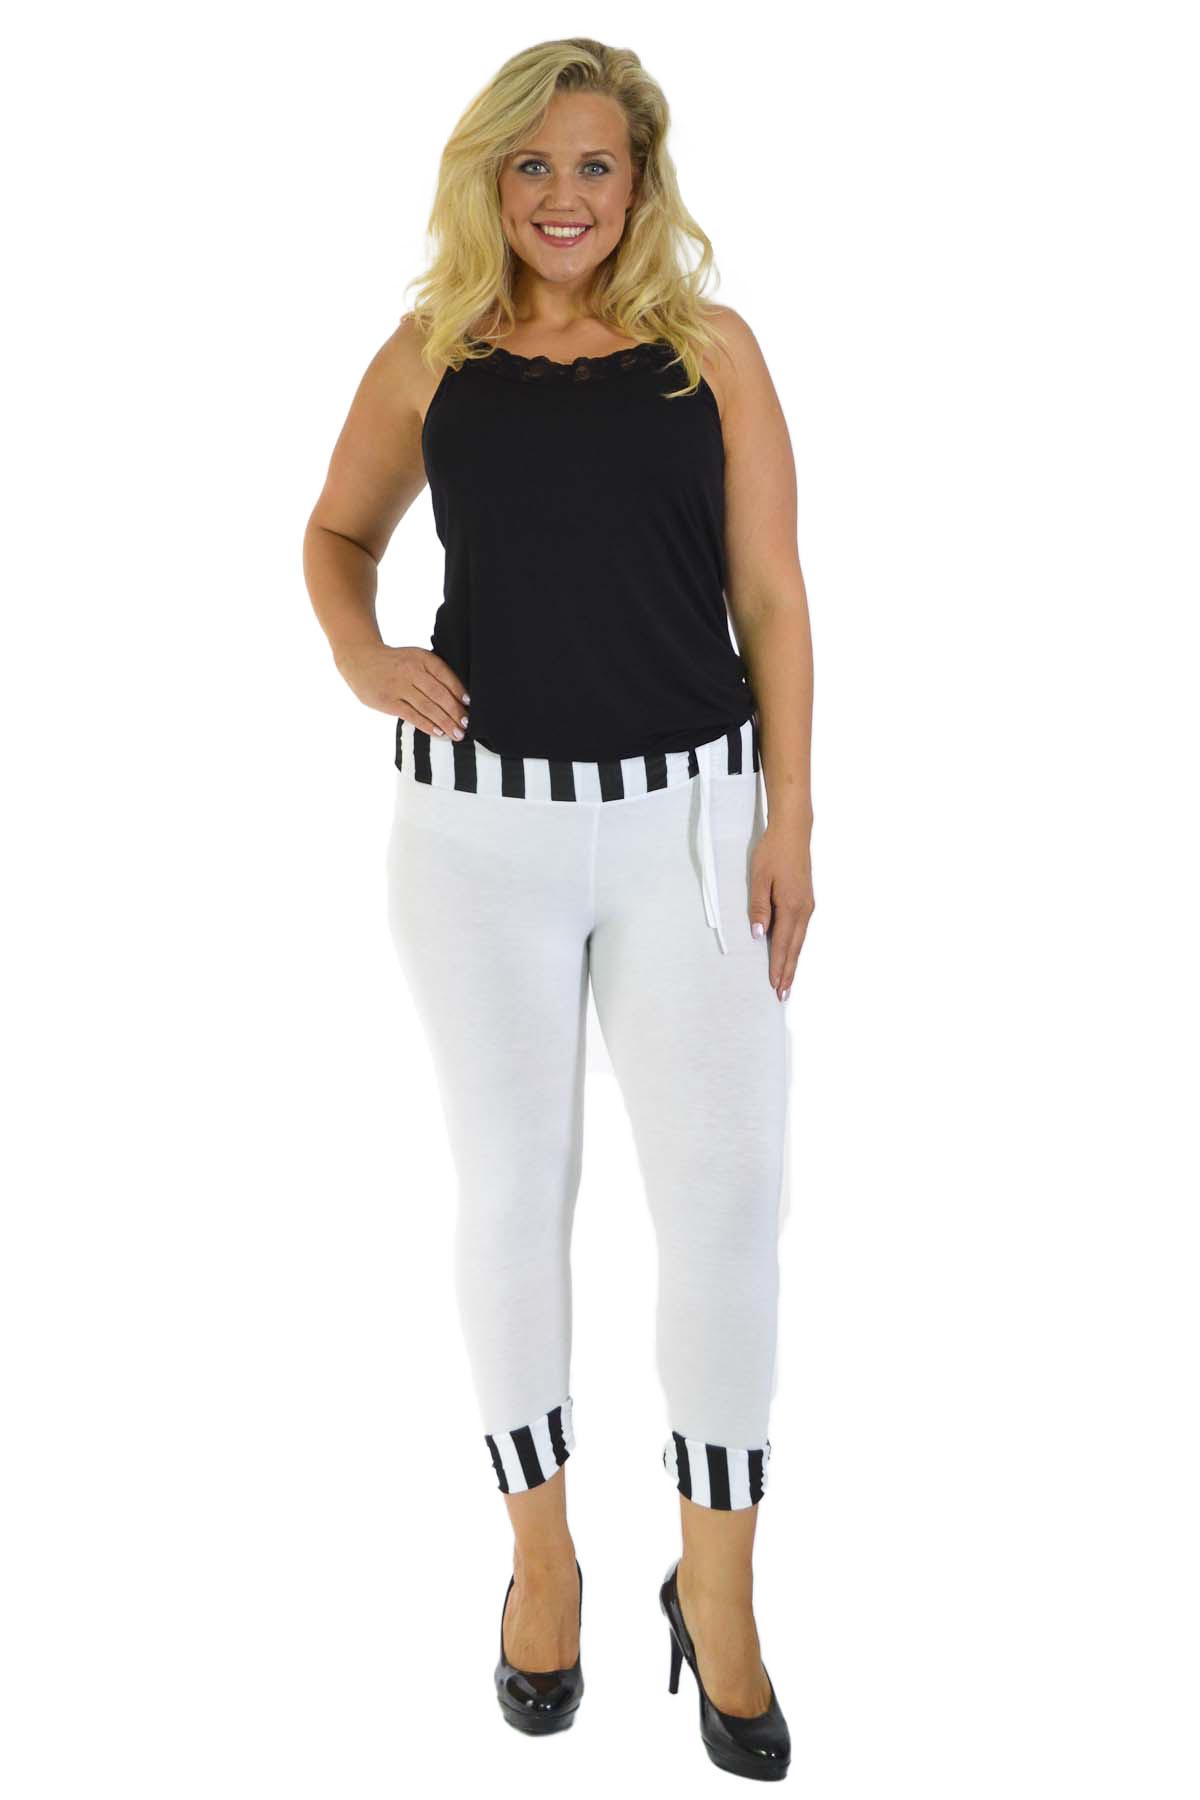 New-Womens-Plus-Size-Leggings-Ladies-Stripe-Print-Cropped-Trouser-Waist-Nouvelle thumbnail 5